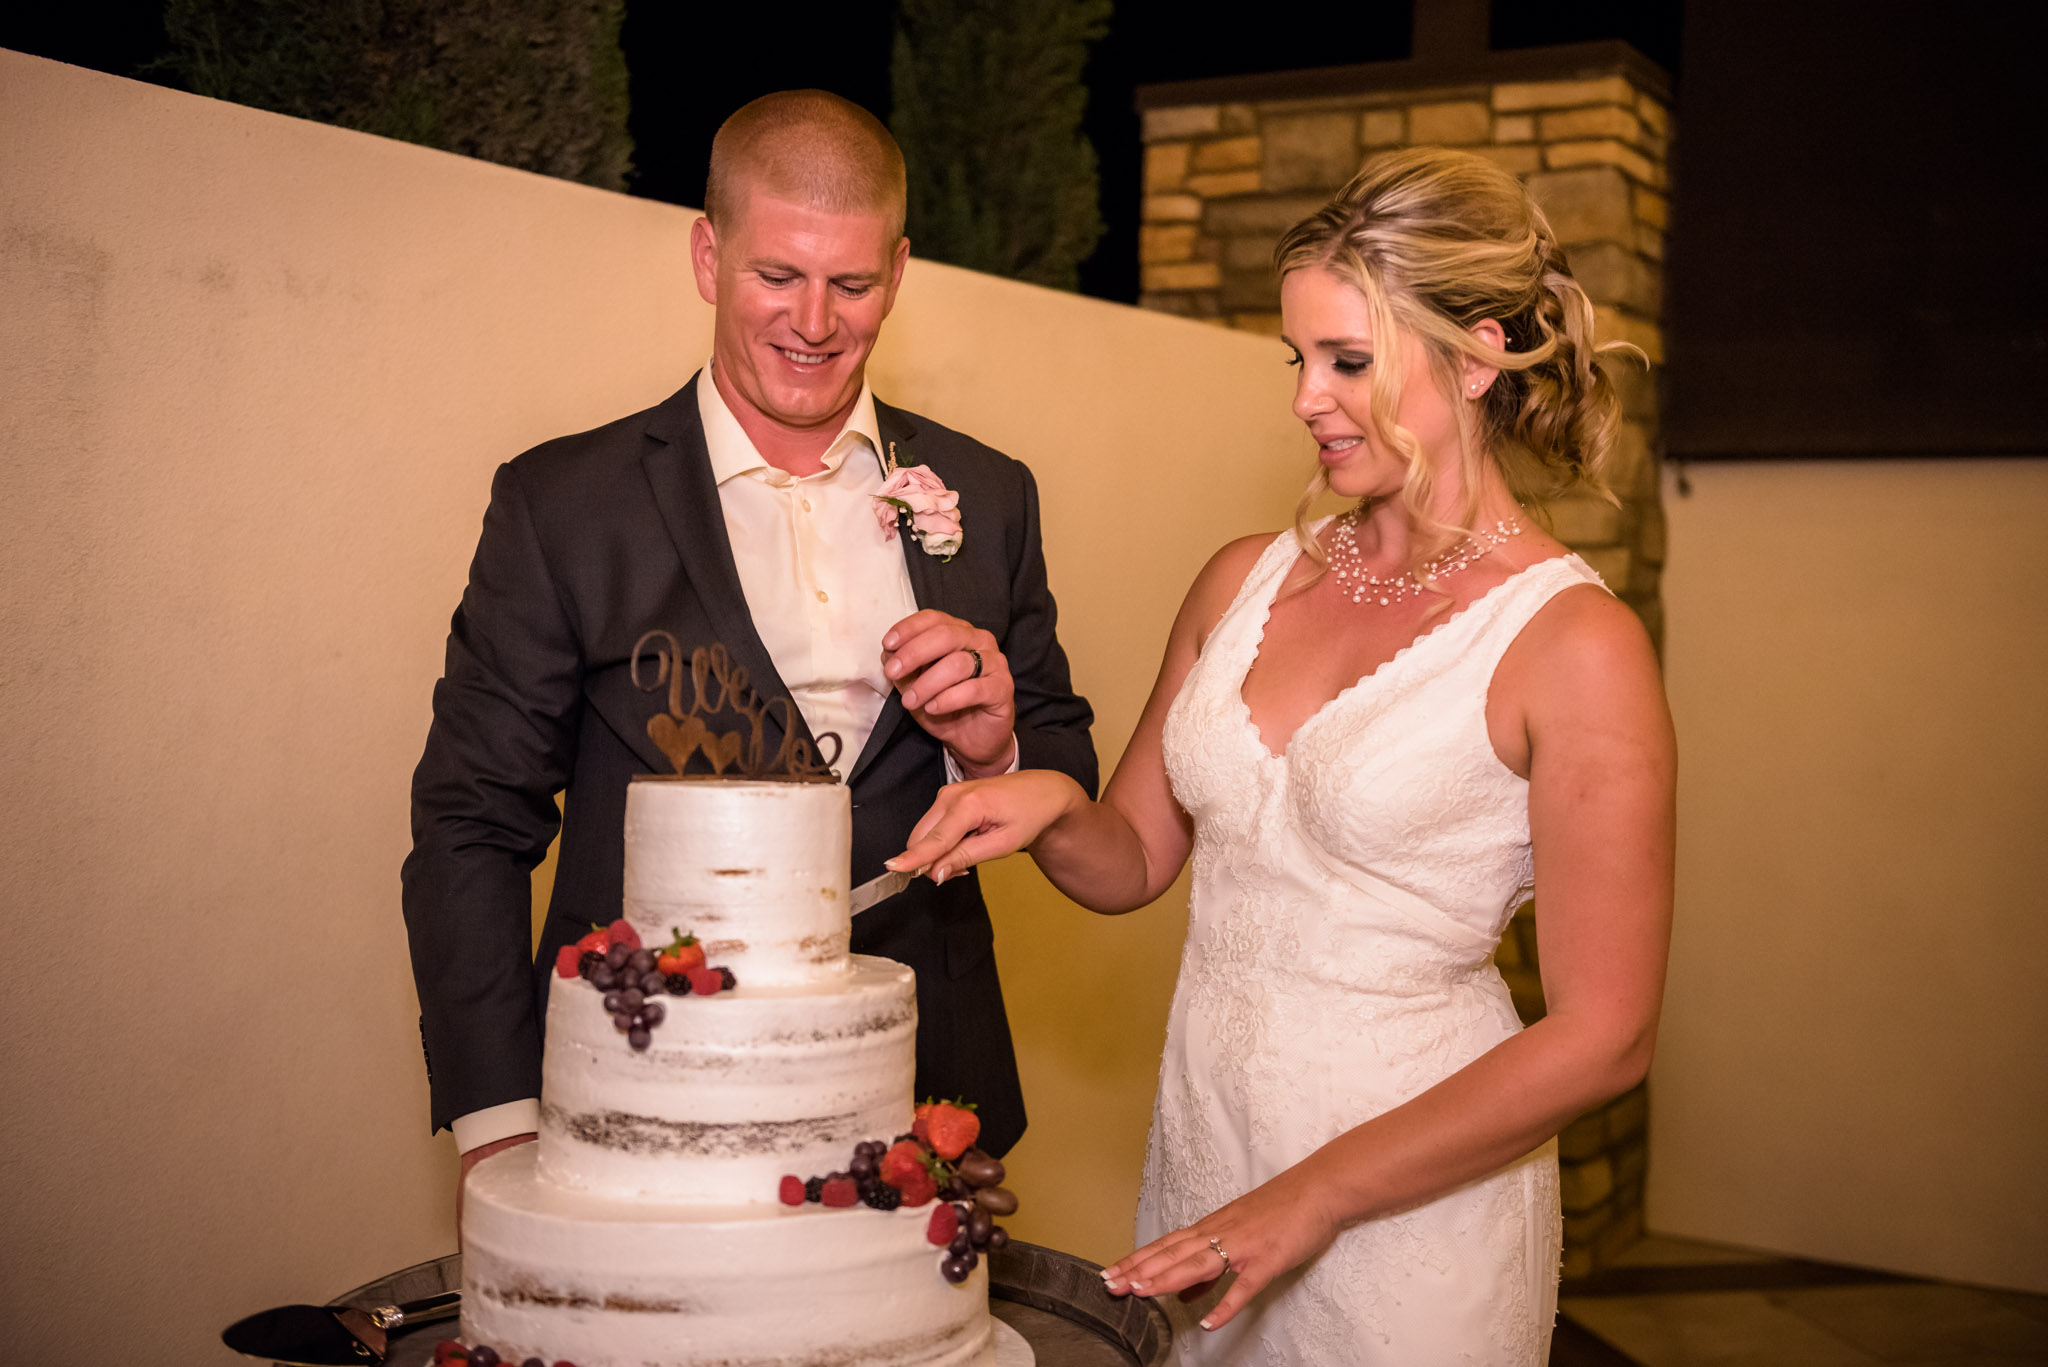 Avensole-Winery-Temecula-Wedding-Josh-and-Olivia-4331.JPG